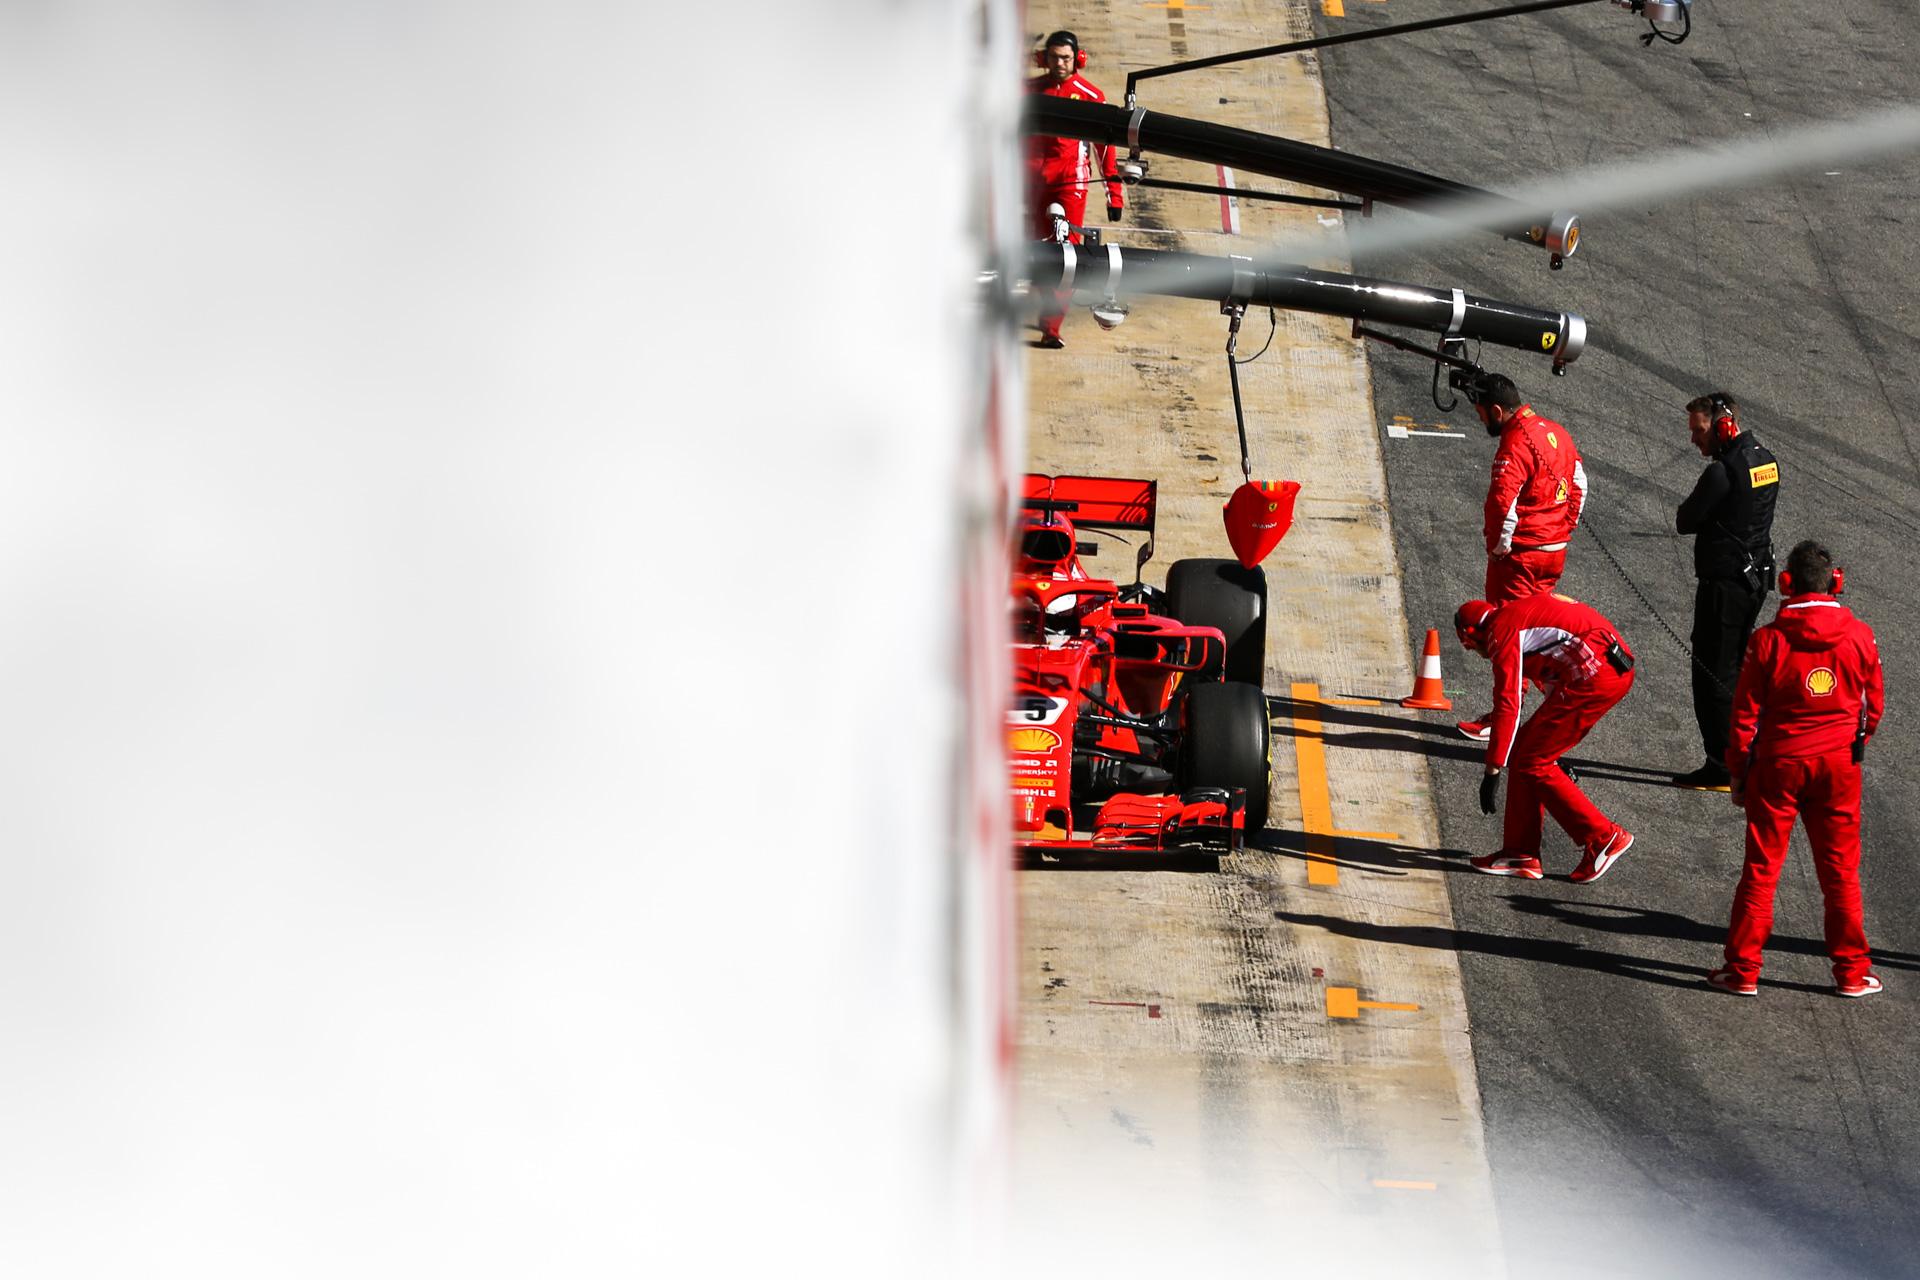 Sebastian VETTEL - Germany - SCUDERIA FERRARI - #05- F1 Test Days - Circuit de Barcelona Catalunya - Spain - 06 March 2018